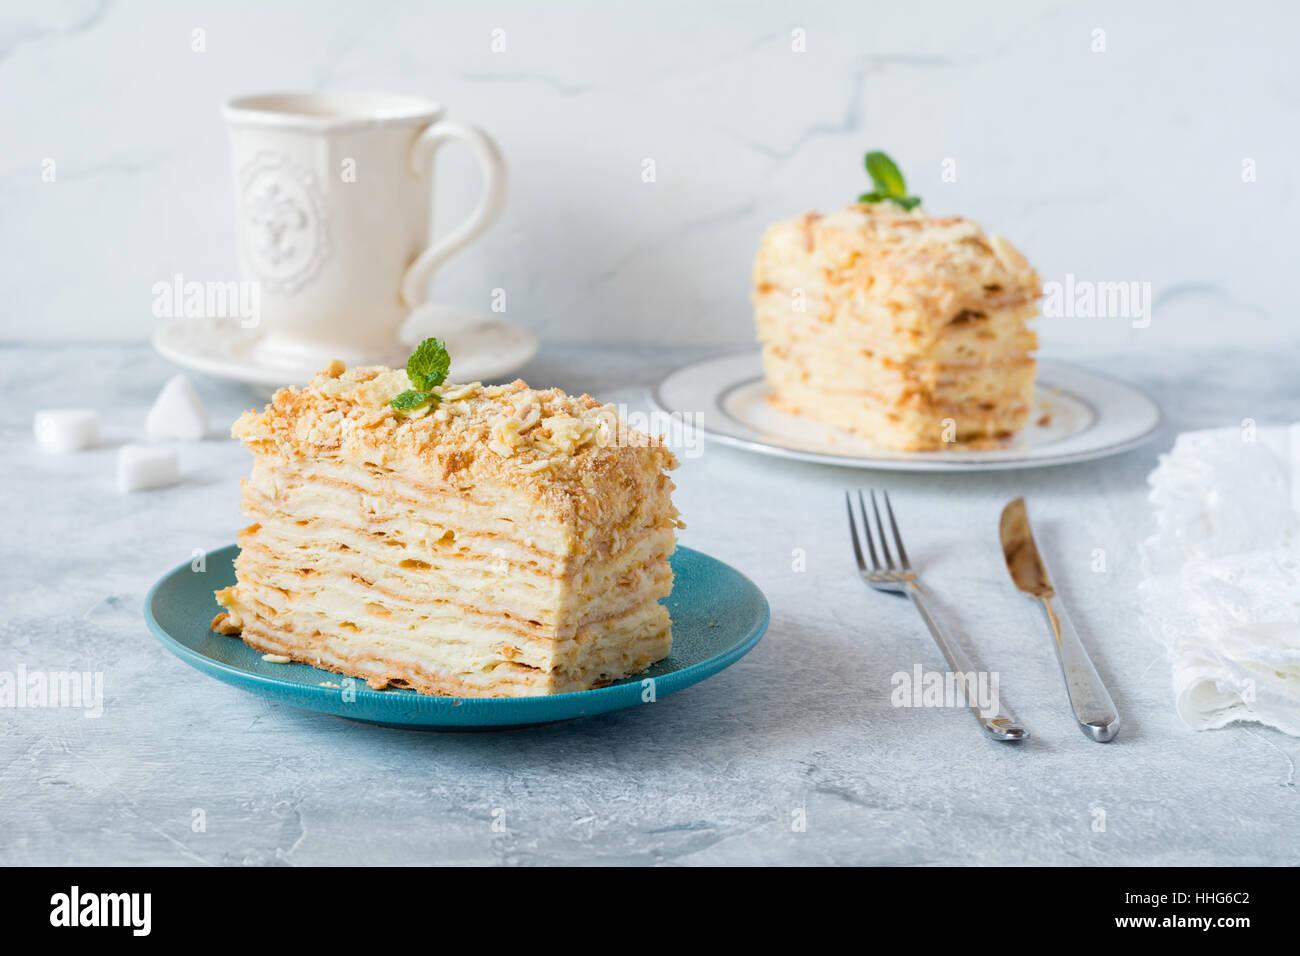 Napoleon cake - multi layered cake with pastry cream. - Stock Image